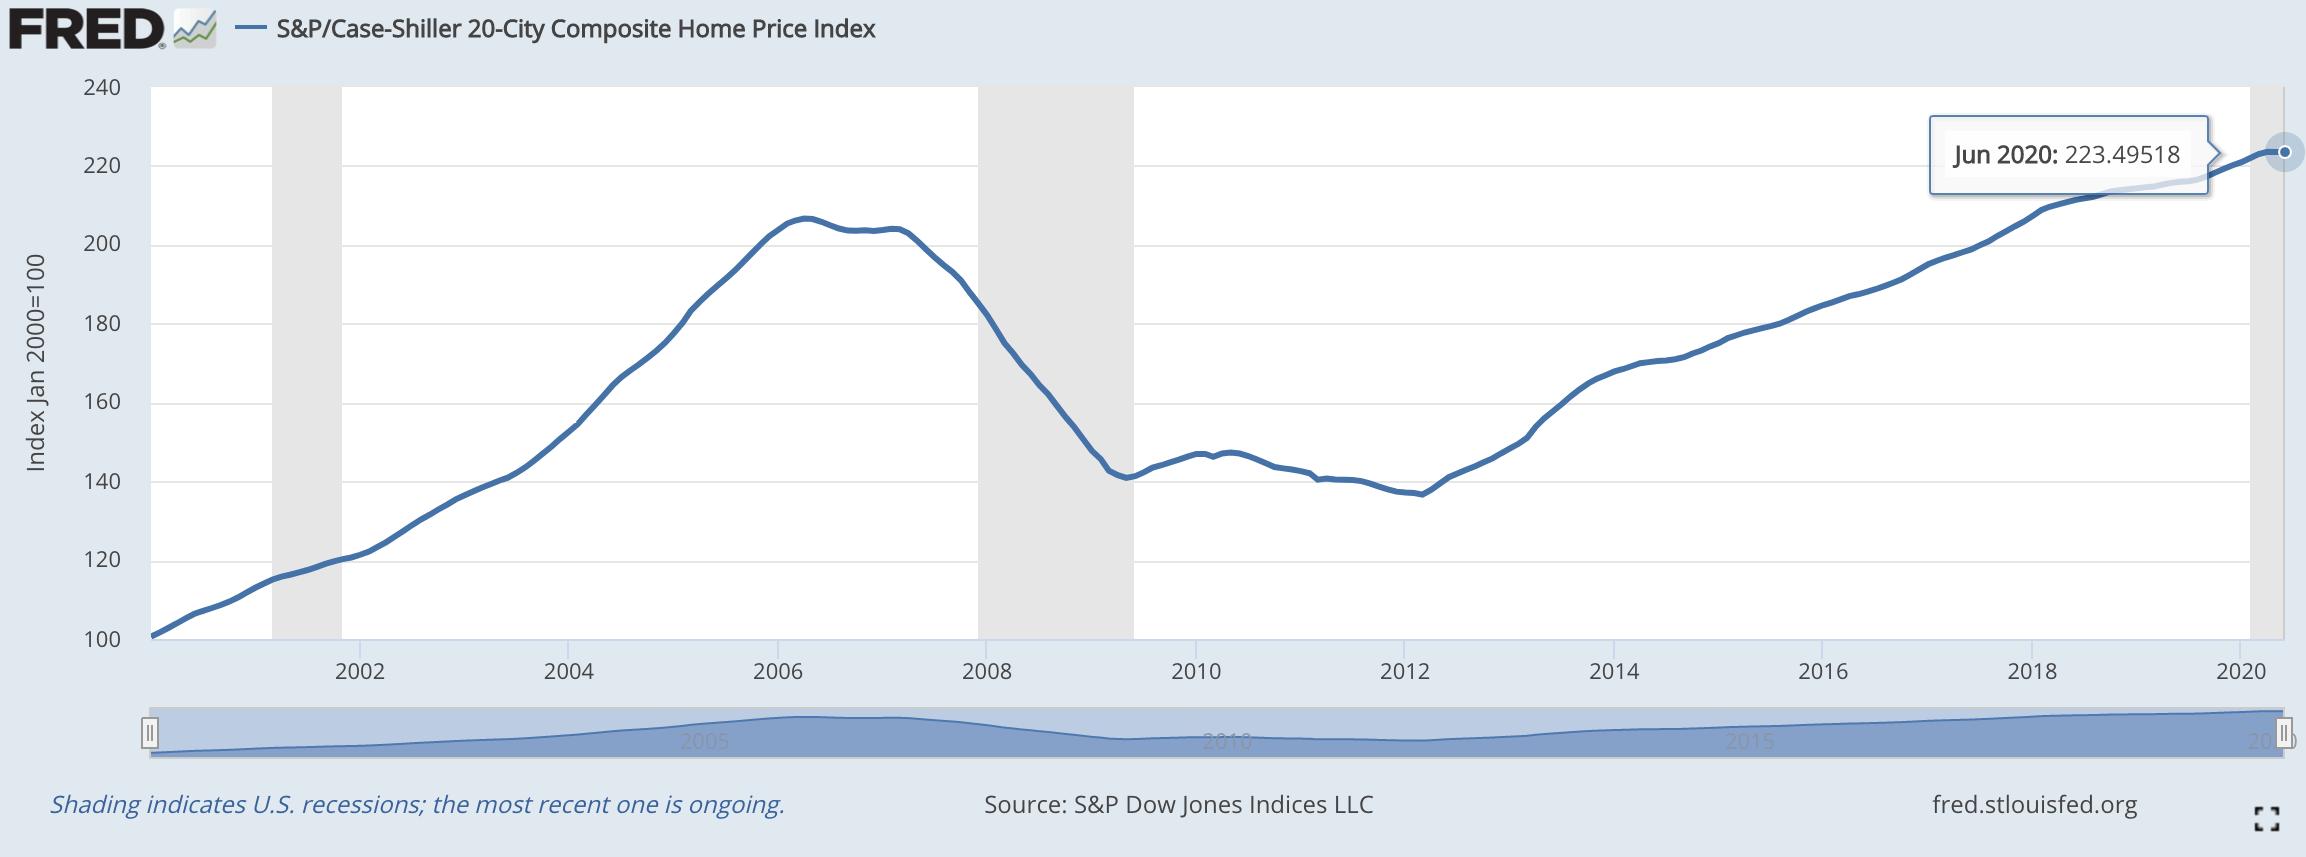 S&P/Case-Shiller Home Price Index